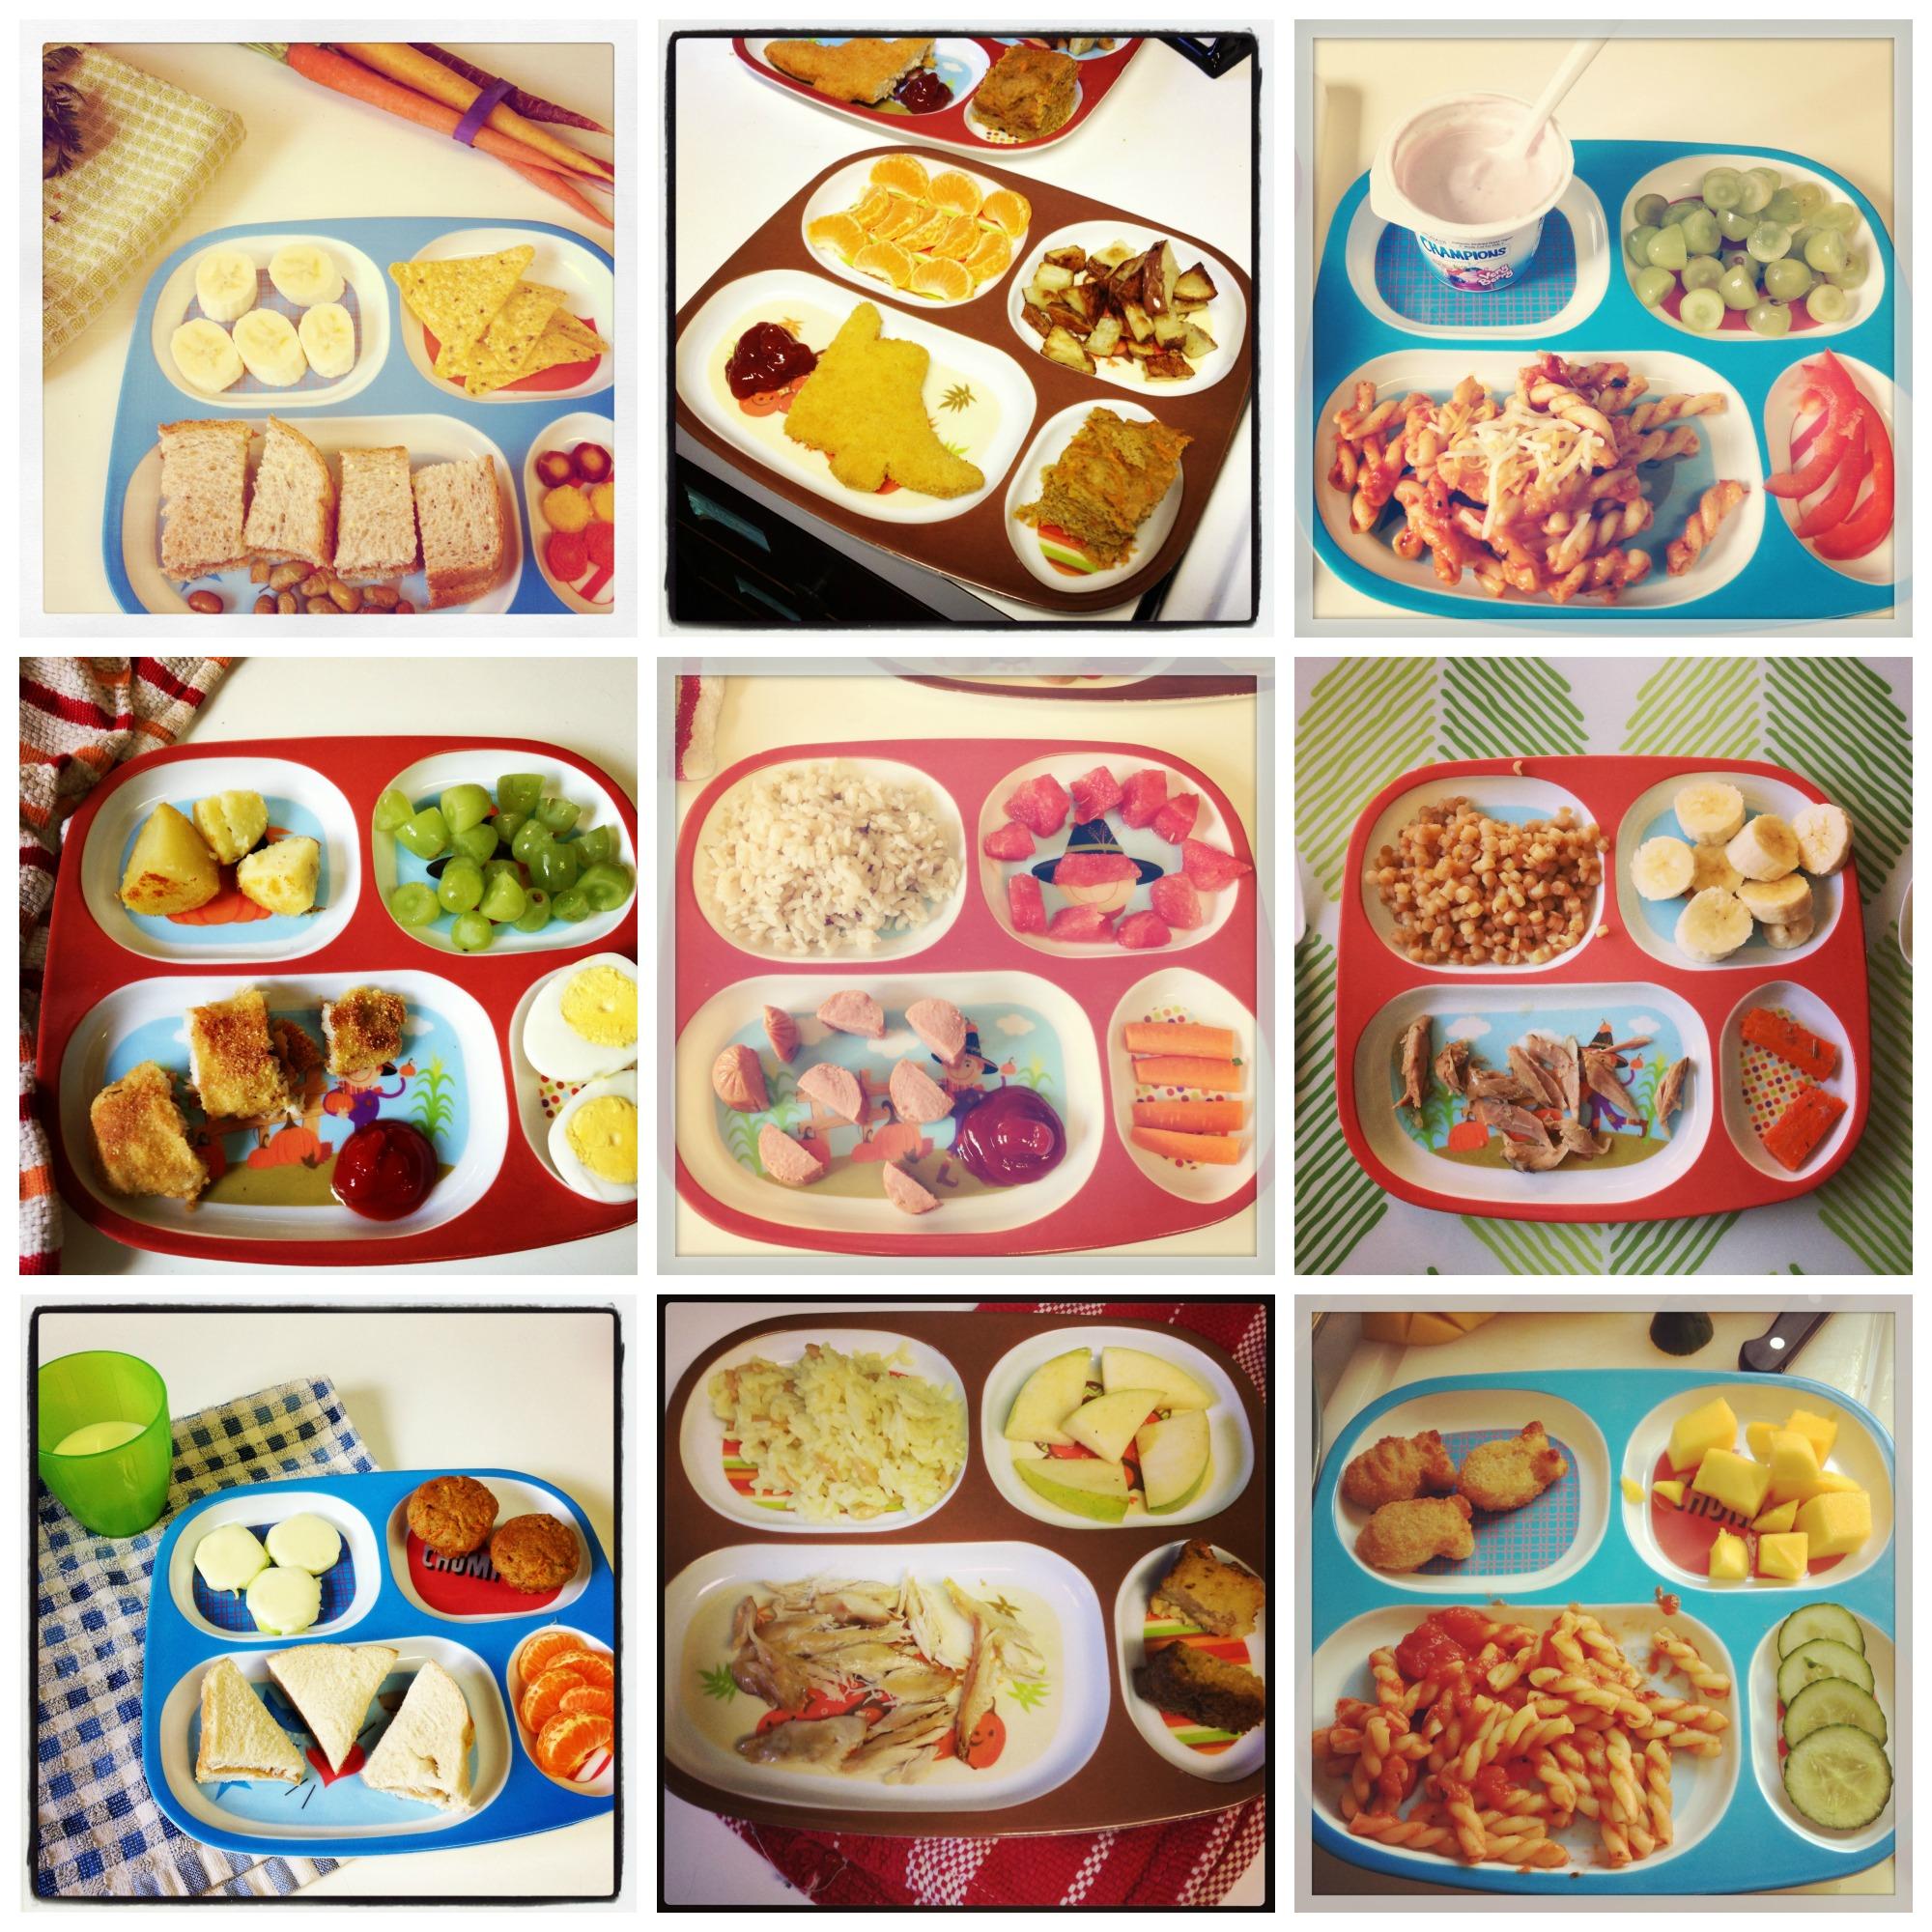 dinnerplates  sc 1 st  Rivki Silver & Cute Dinner Trays for Kids u2013 Giveaway! u2013 Rivki Silver ~ thoughts u0026 music